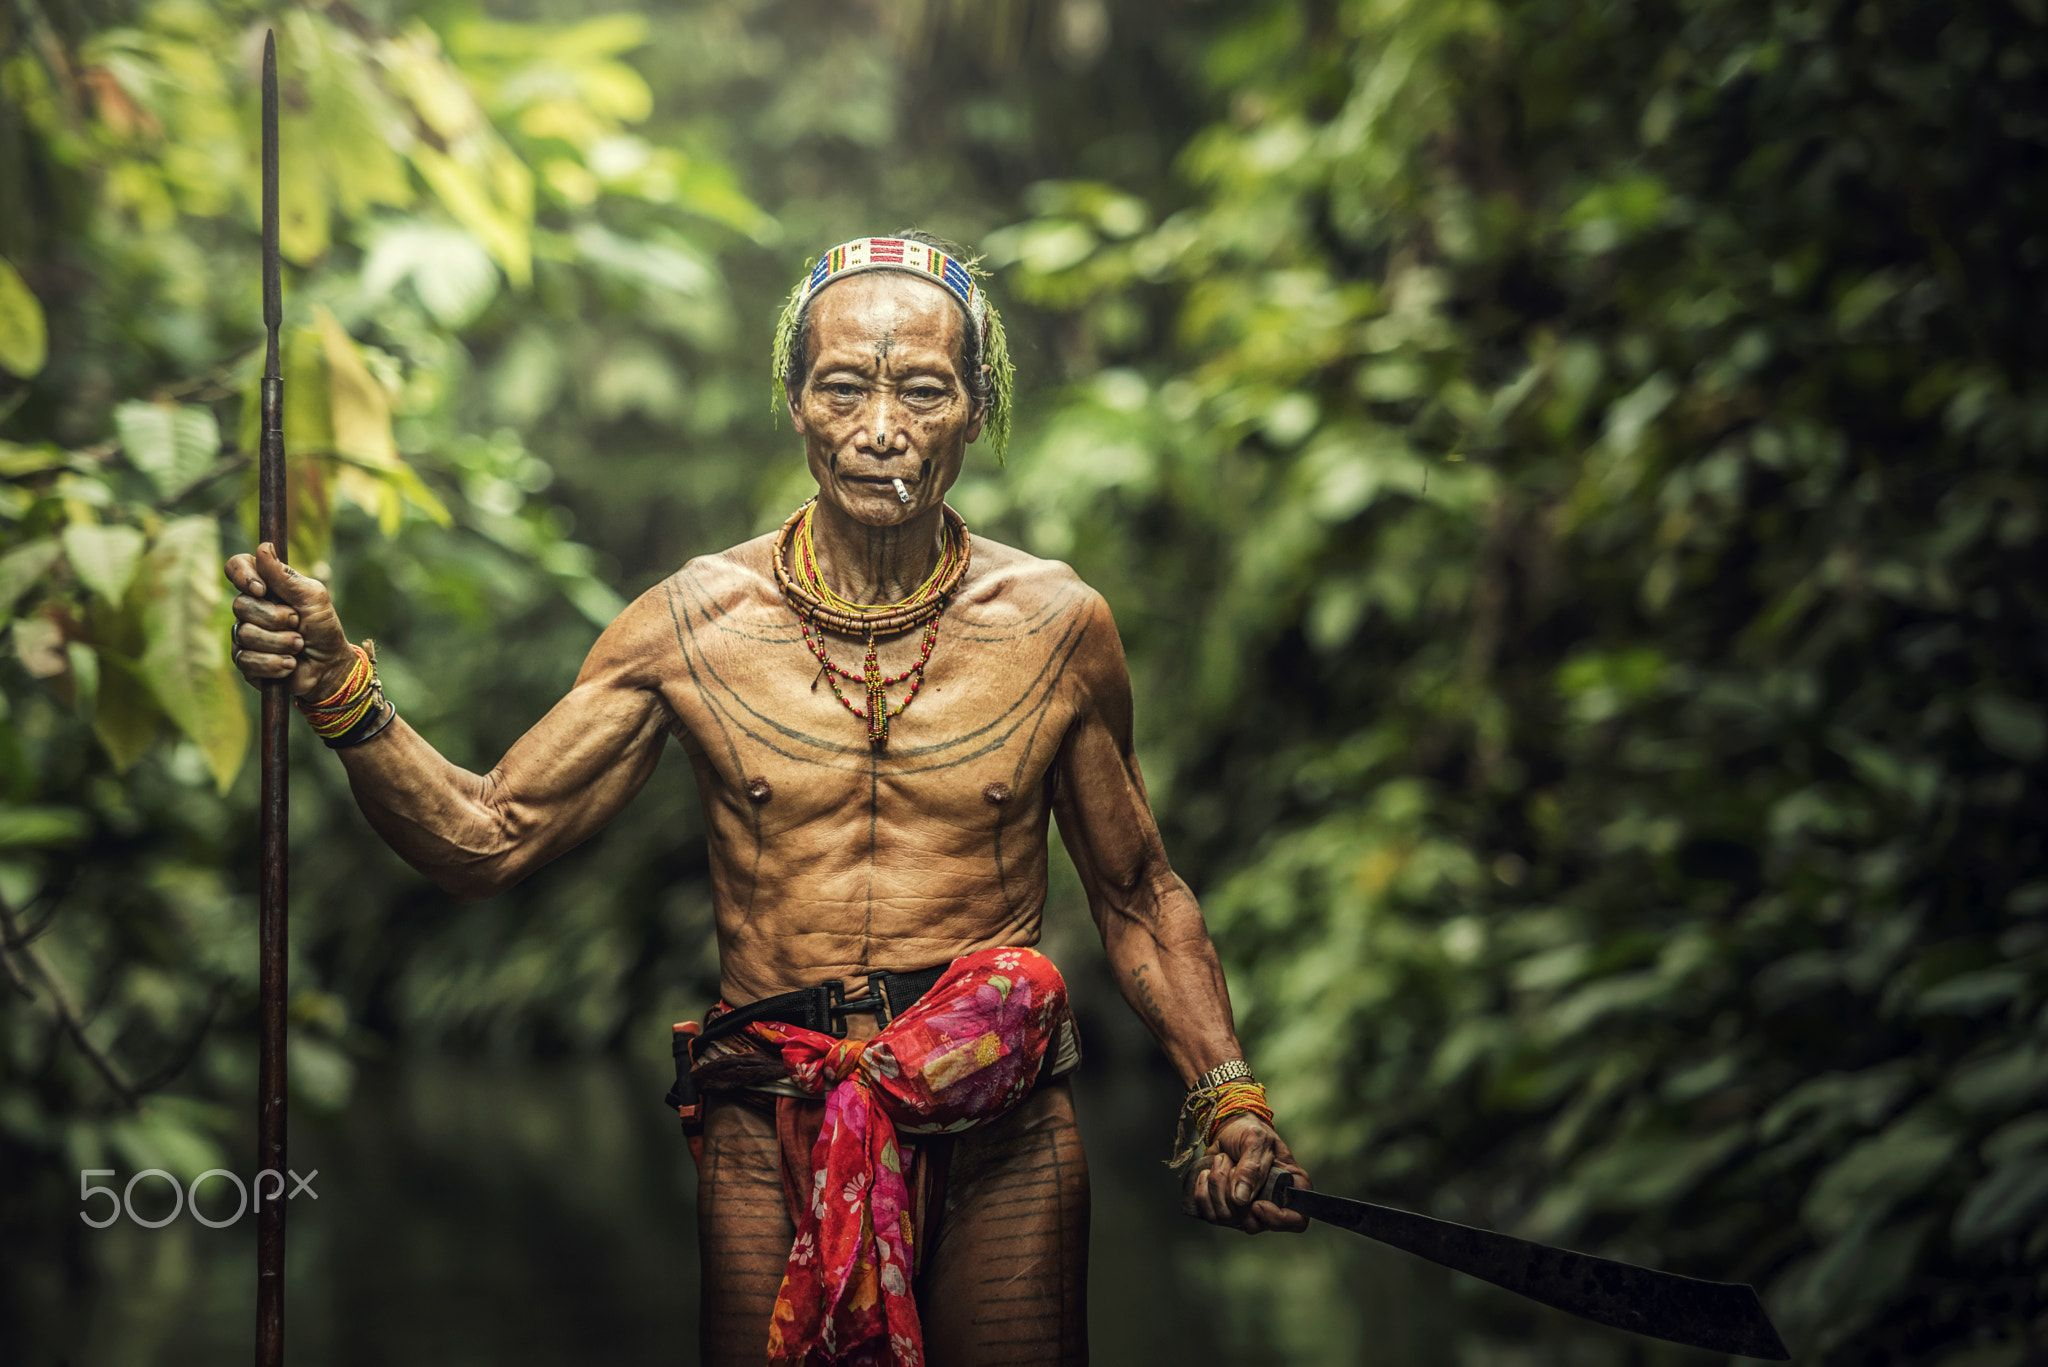 Mentawai Warrior - Mentawai Warrior, Siberut Tribes, Mentawai Island,  Indonesia | Foto zaman dulu, Sketsa tato, Sketsa